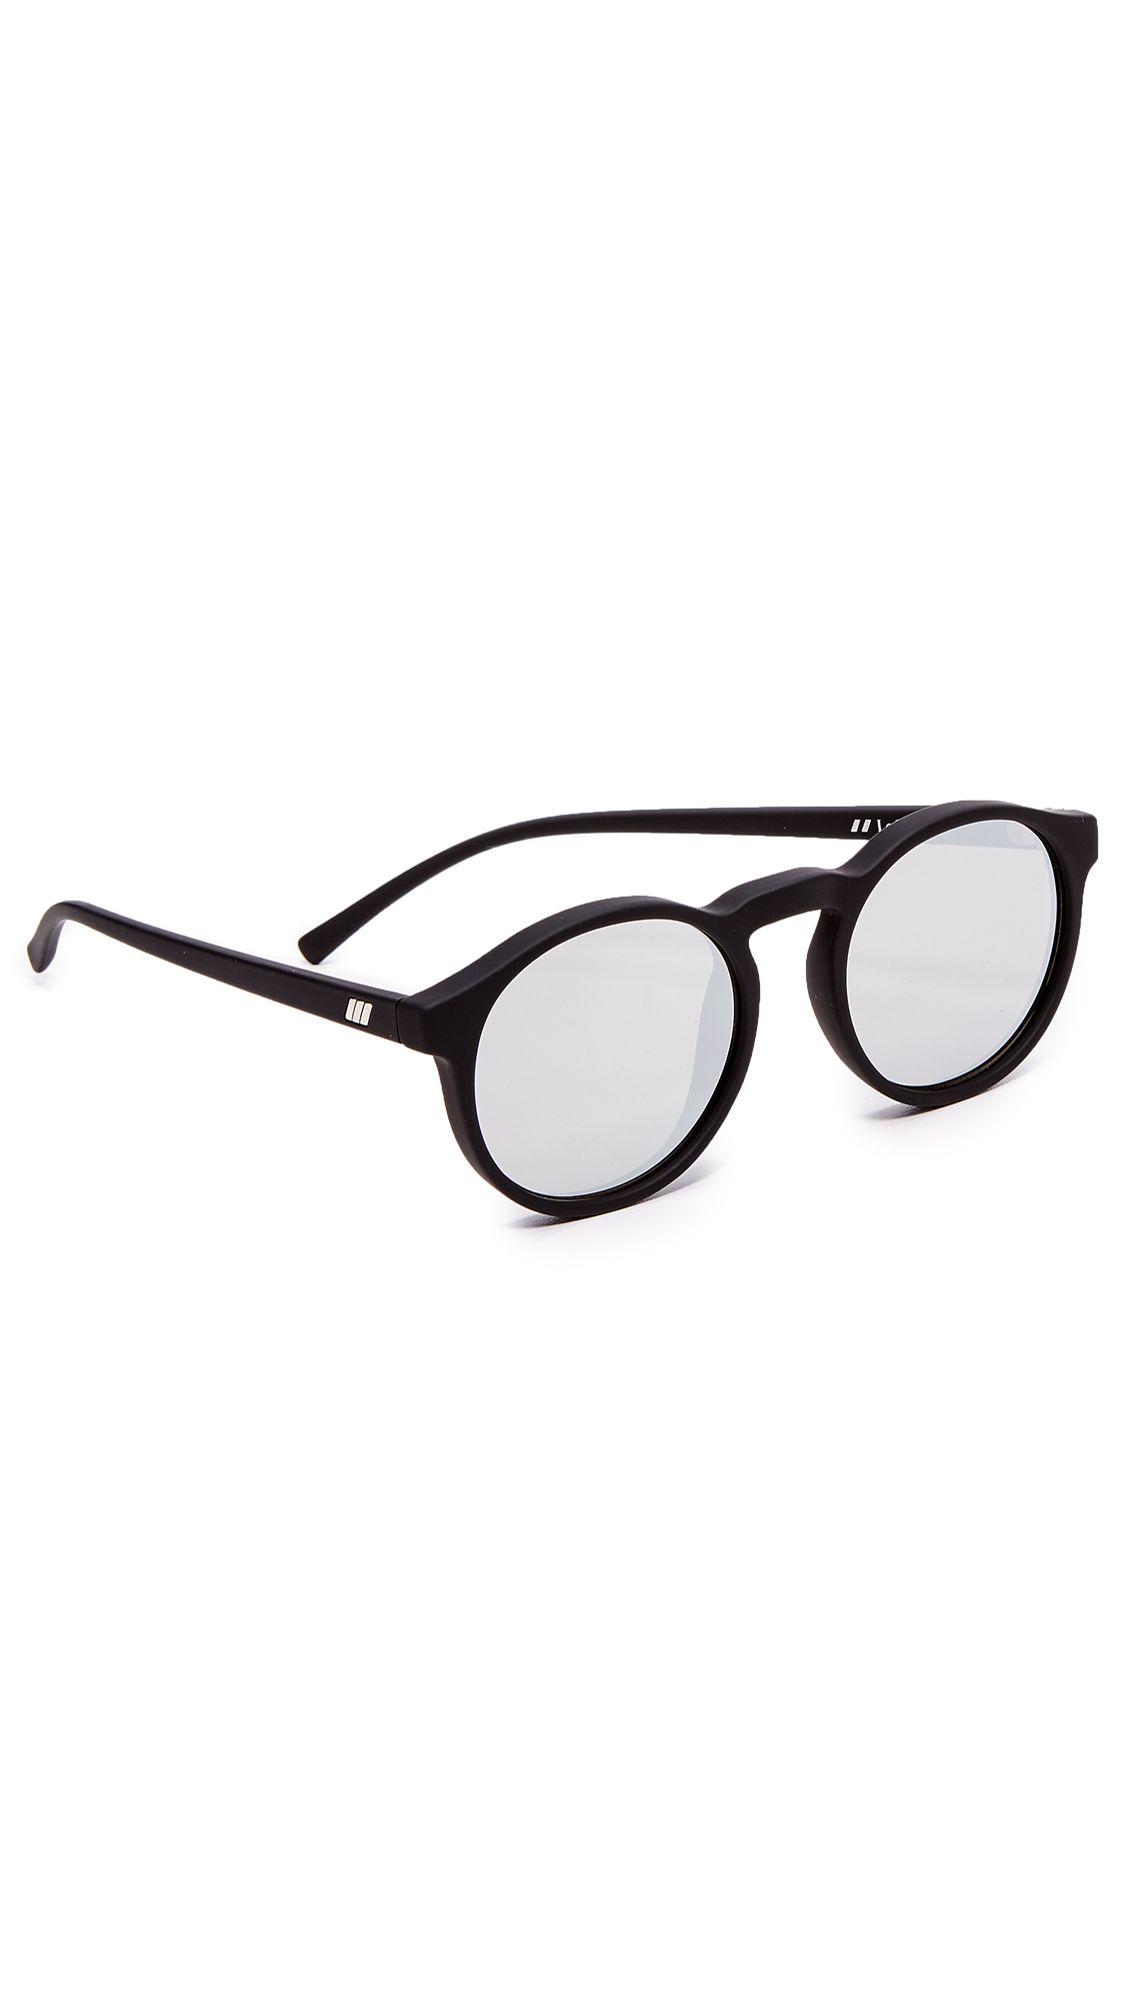 e157455449 LE SPECS Cubanos Sunglasses.  lespecs  sunglasses